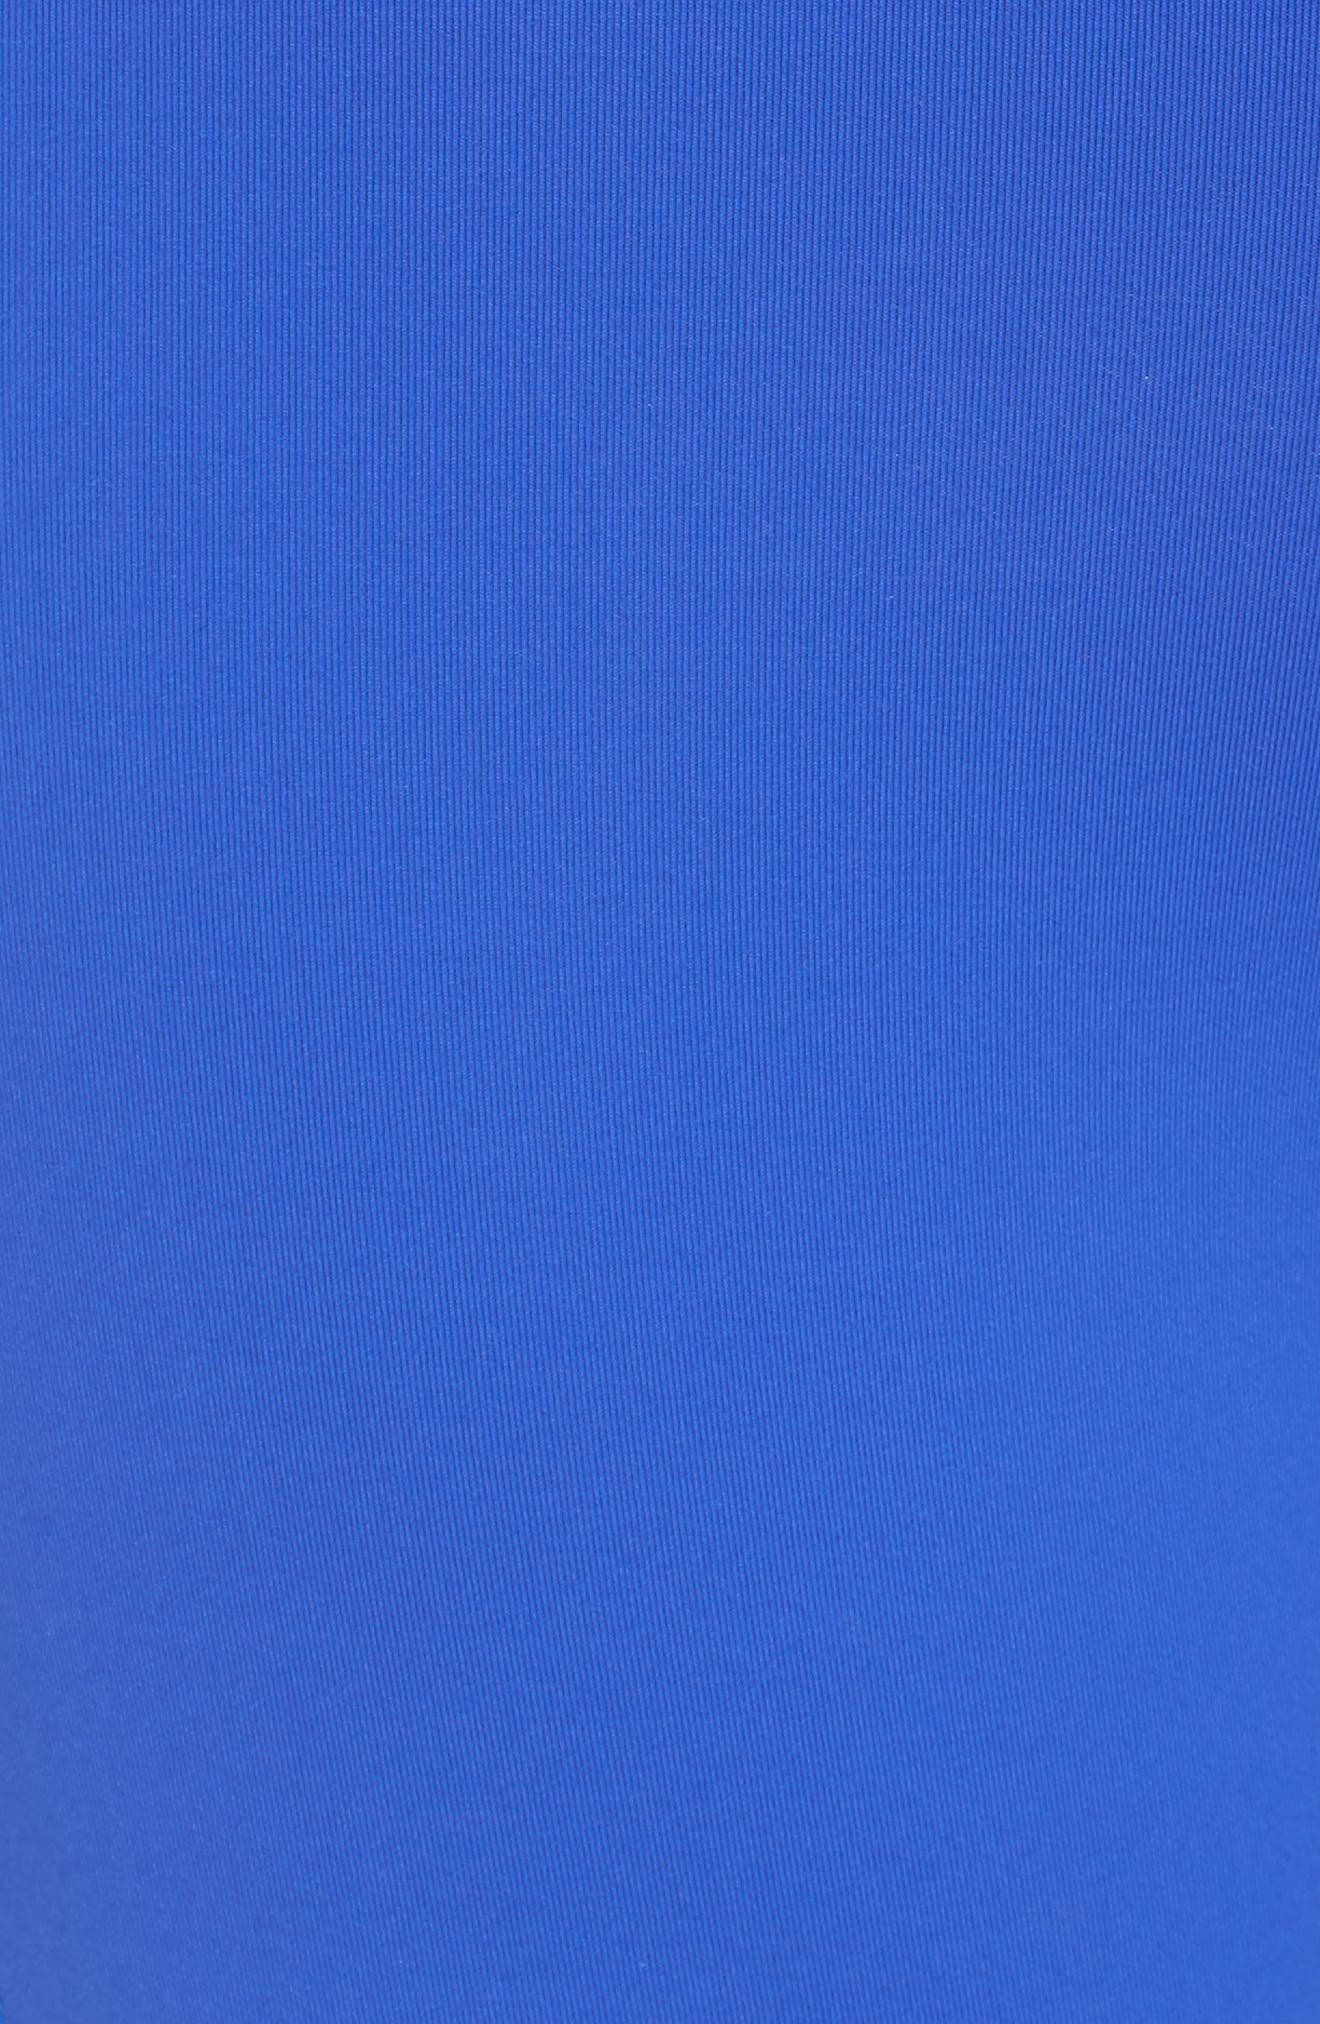 High Waist Mesh Tights,                             Alternate thumbnail 7, color,                             Acid Blue